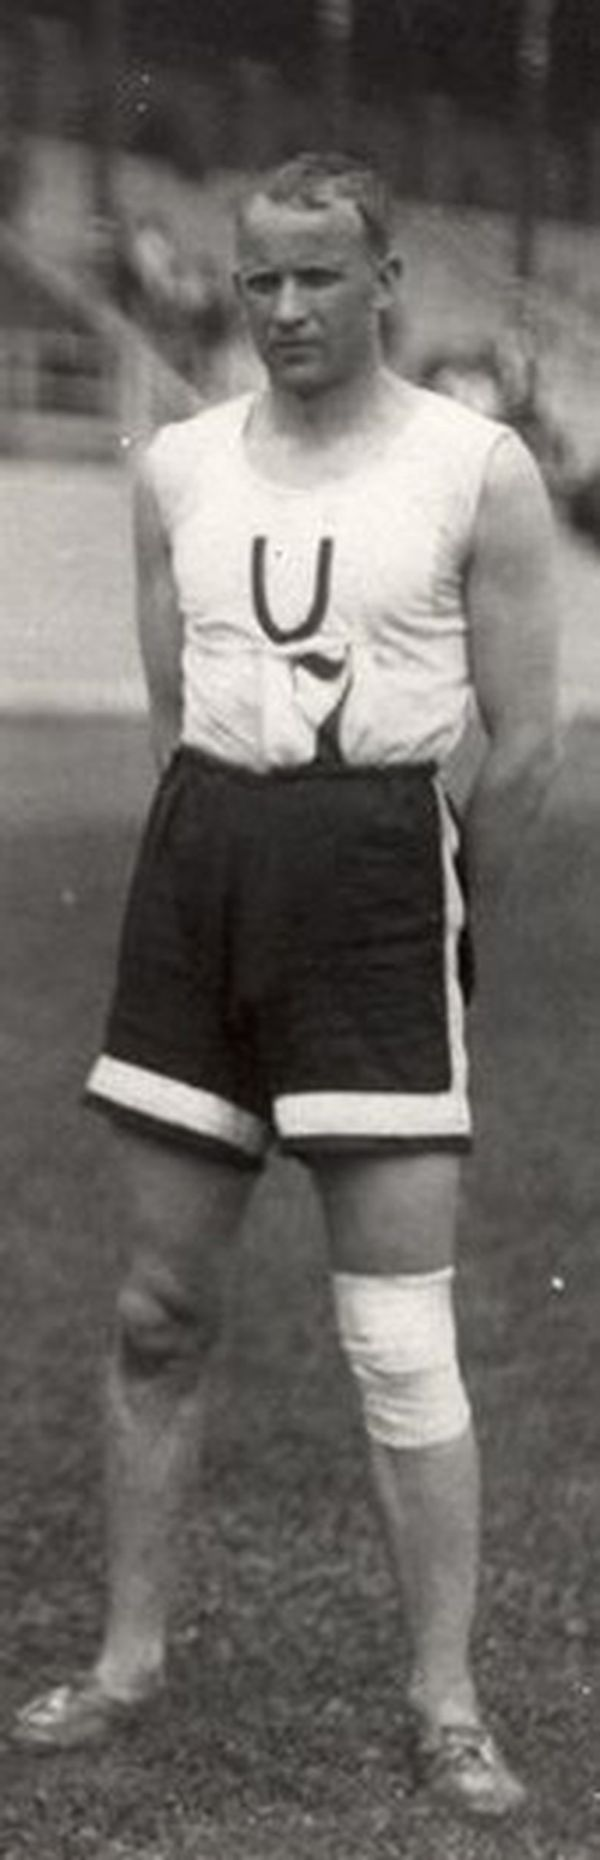 Gusta Holmer